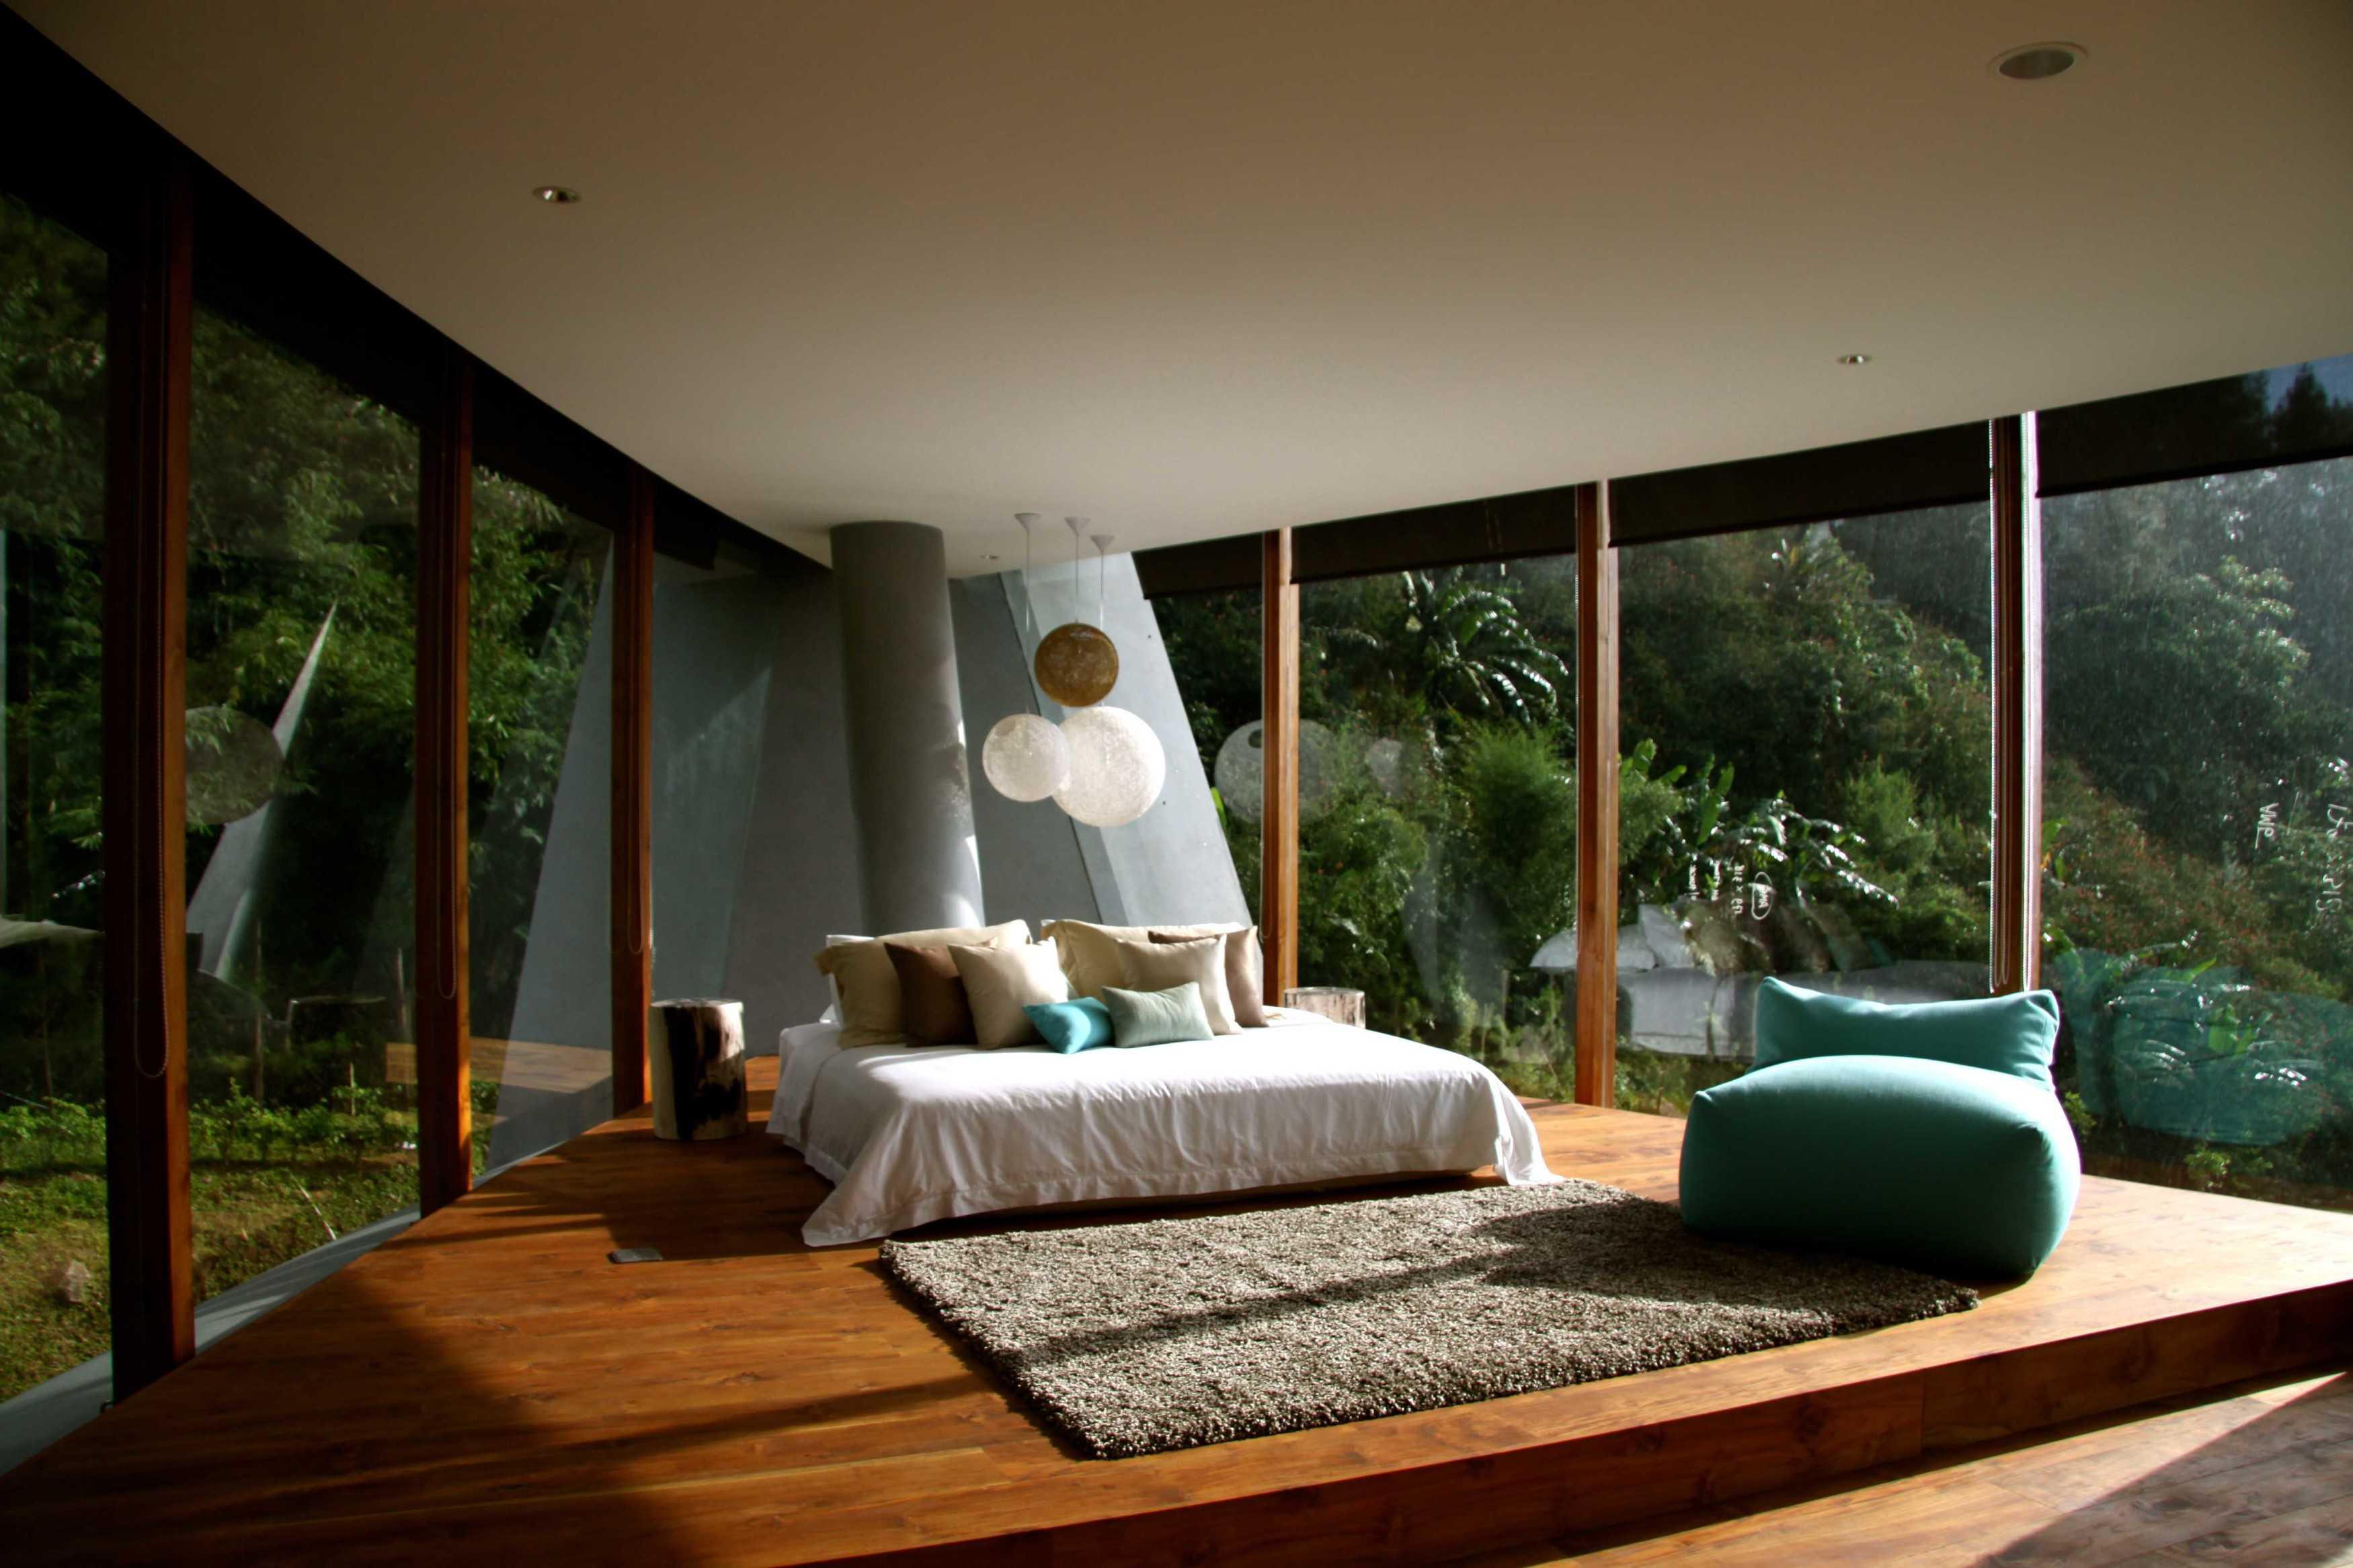 Rudy Dodo Private Villa Cilember, Puncak - Bogor Cilember, Puncak - Bogor Bedroom   9180